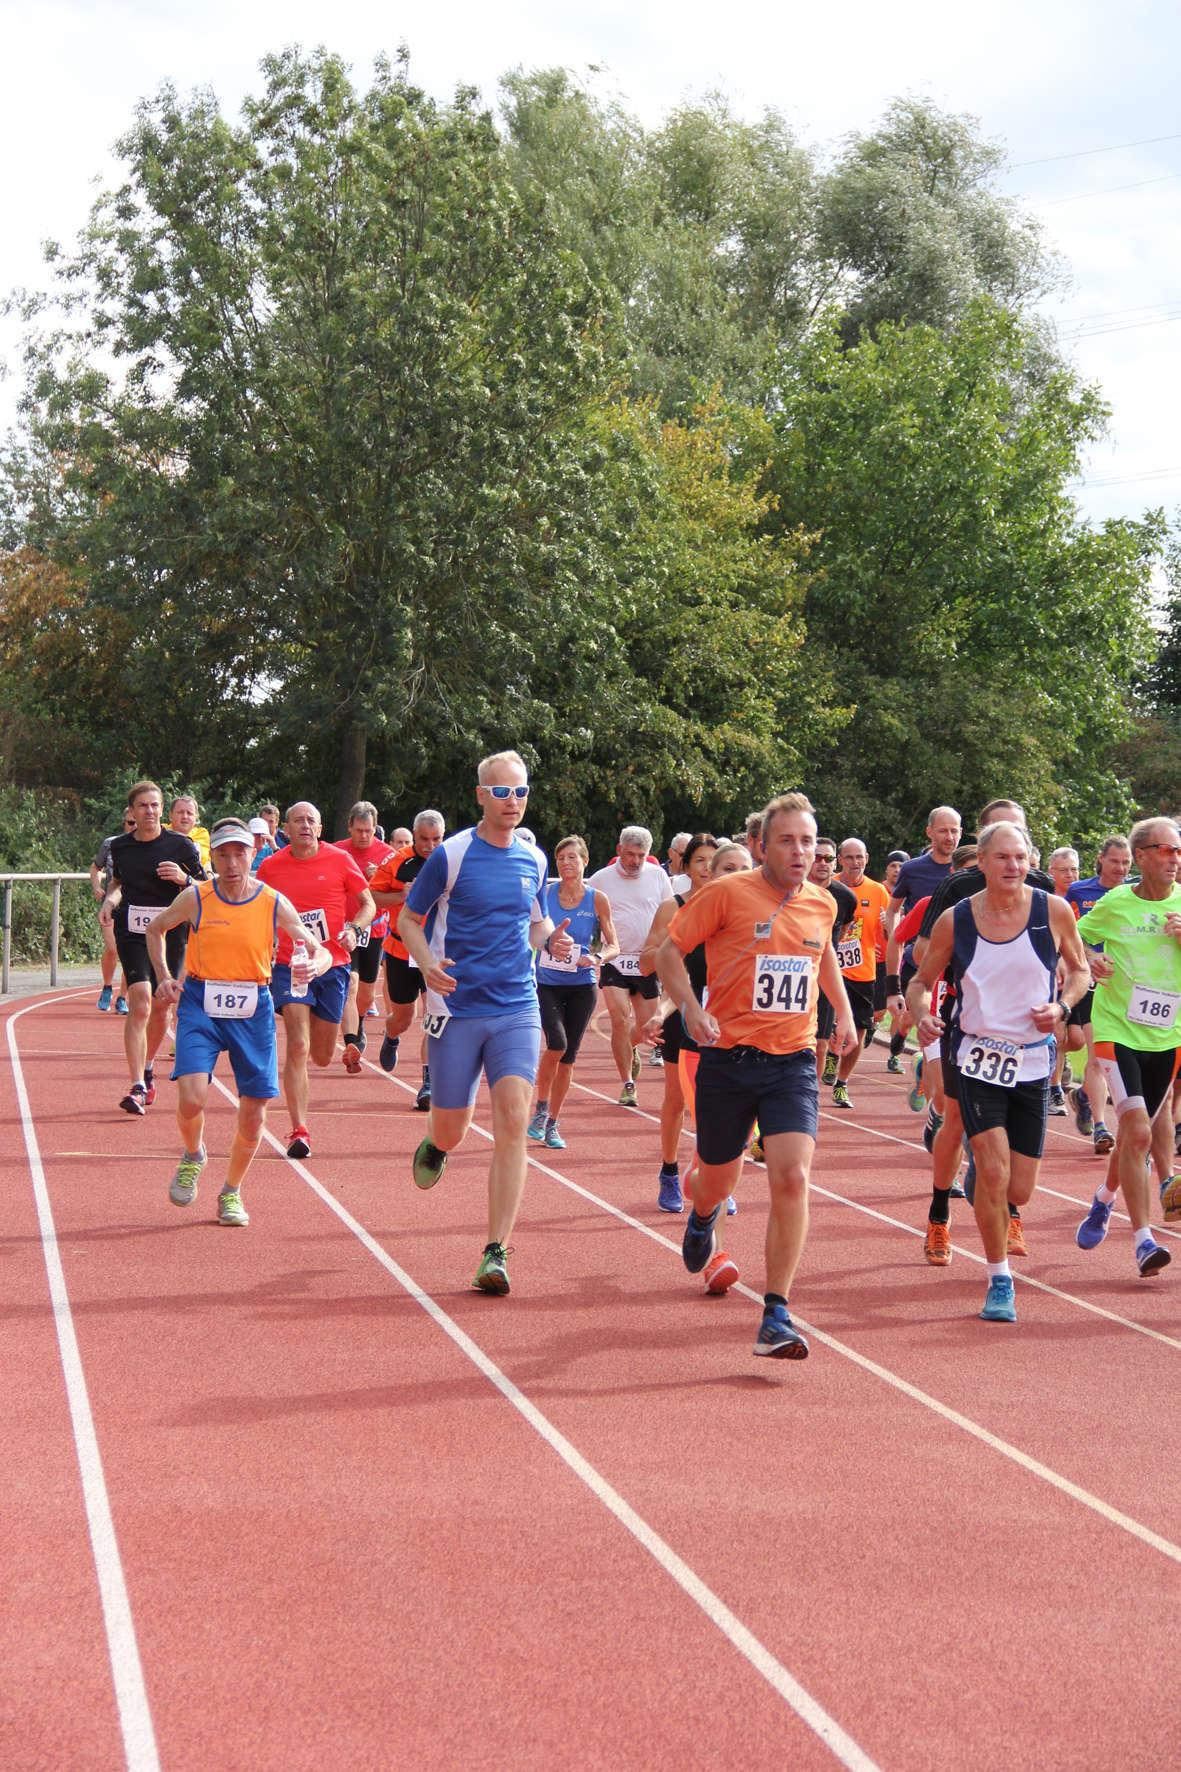 Volkslauf _ 2018 _ 07 _ Start 10 km _ (16)